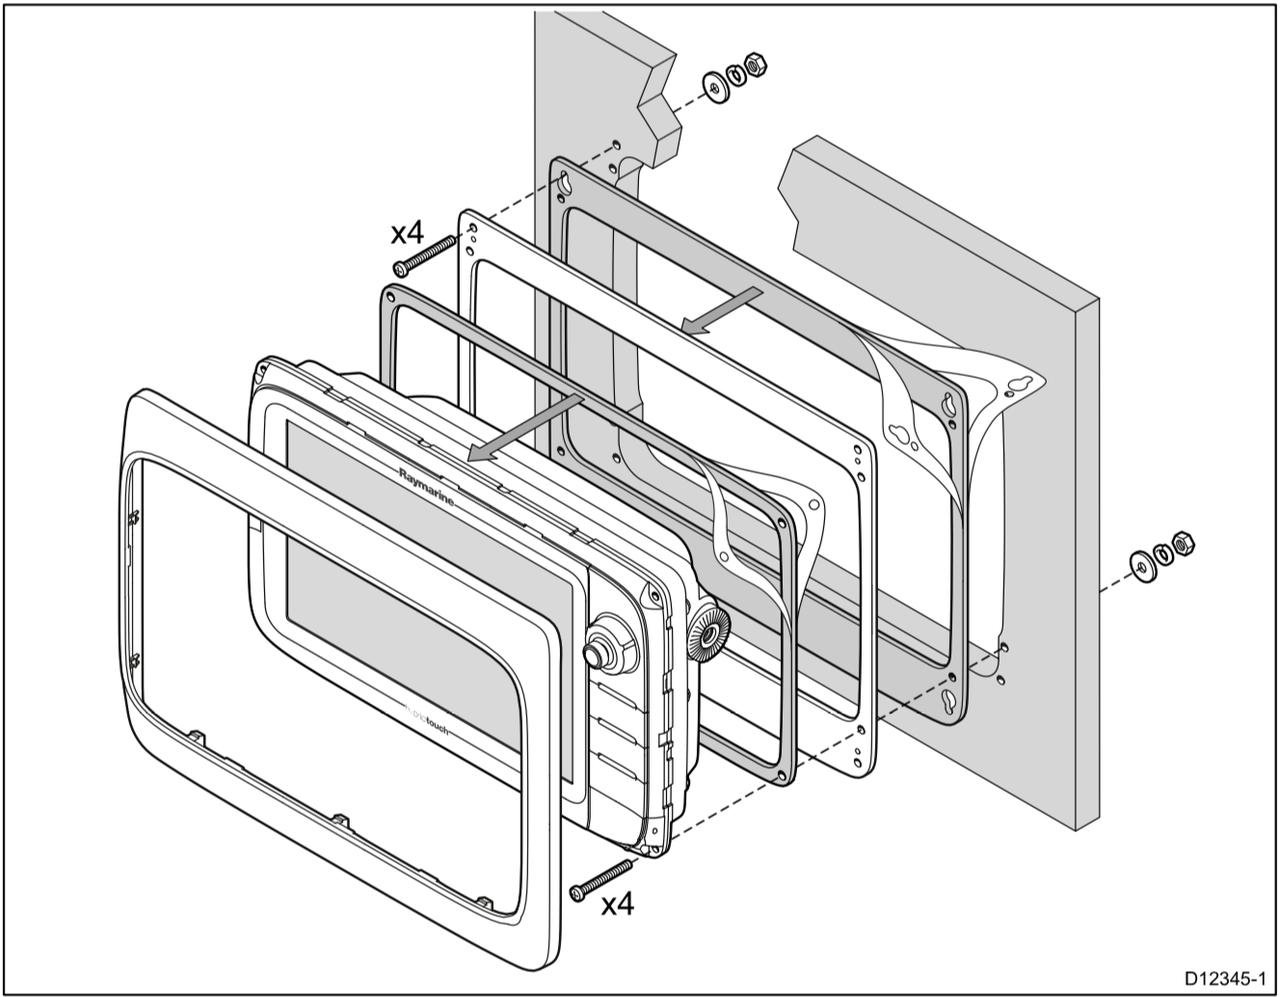 raymarine c80 wiring diagram wiring library Wiring Schematics raymarine c9, e9 mounting adaptor kit for c80 e80 cutout